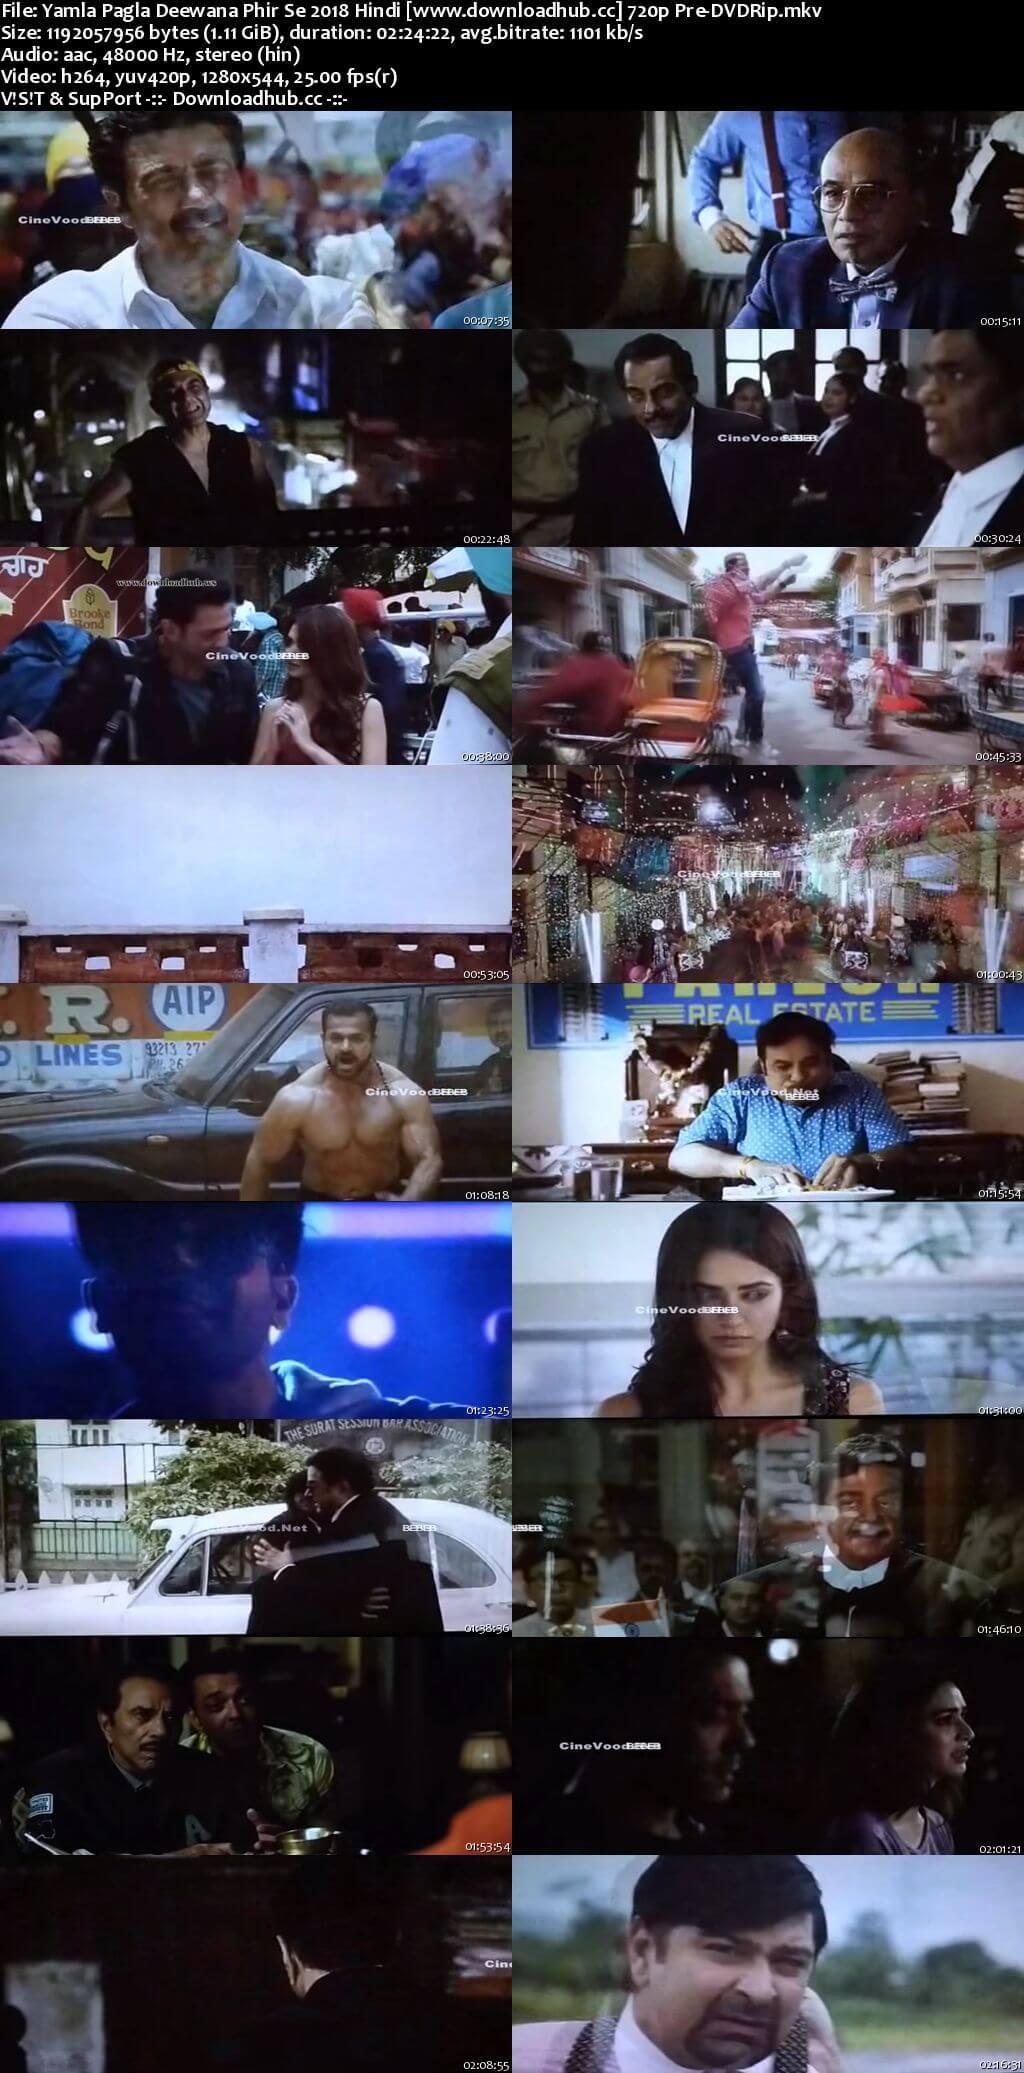 Yamla Pagla Deewana Phir Se 2018 Hindi 720p Pre-DVDRip x264